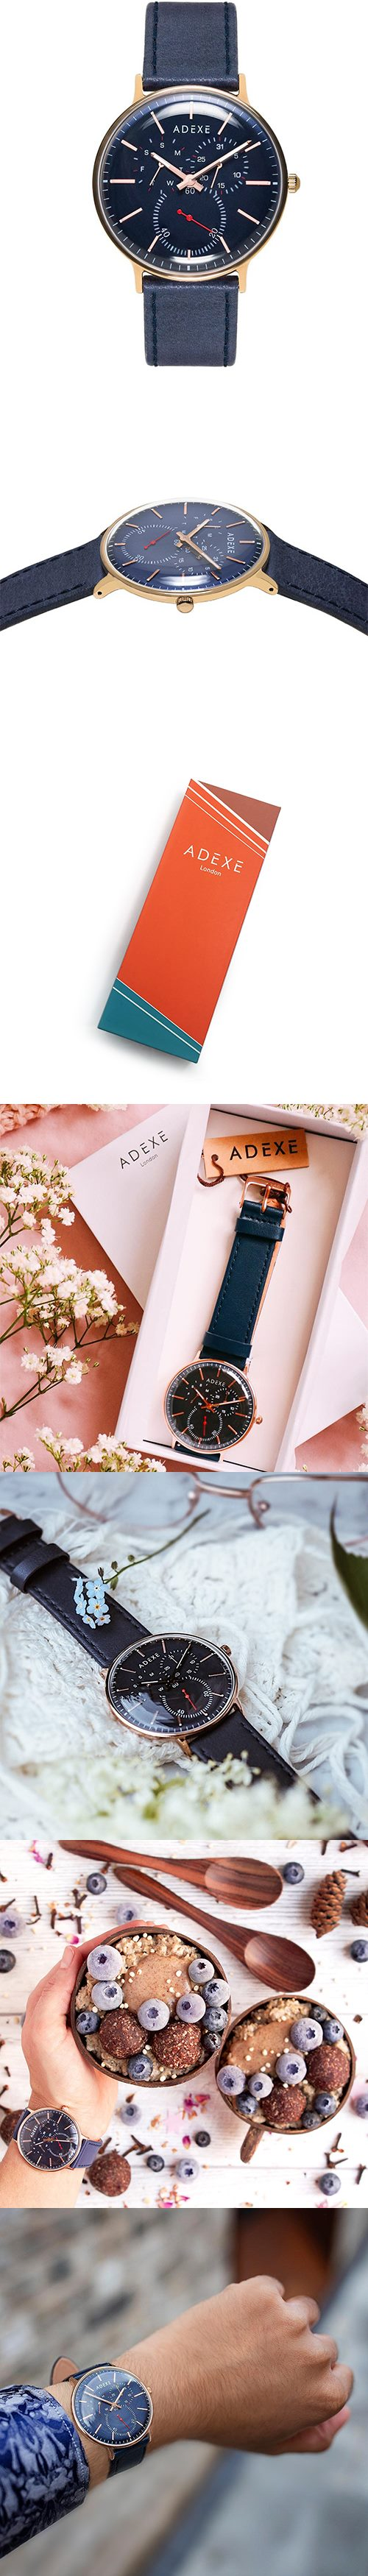 ADEXE|英國時尚手錶 THEY三眼系列 藍錶盤x玫瑰金錶框皮革錶帶41mm 2045C-04